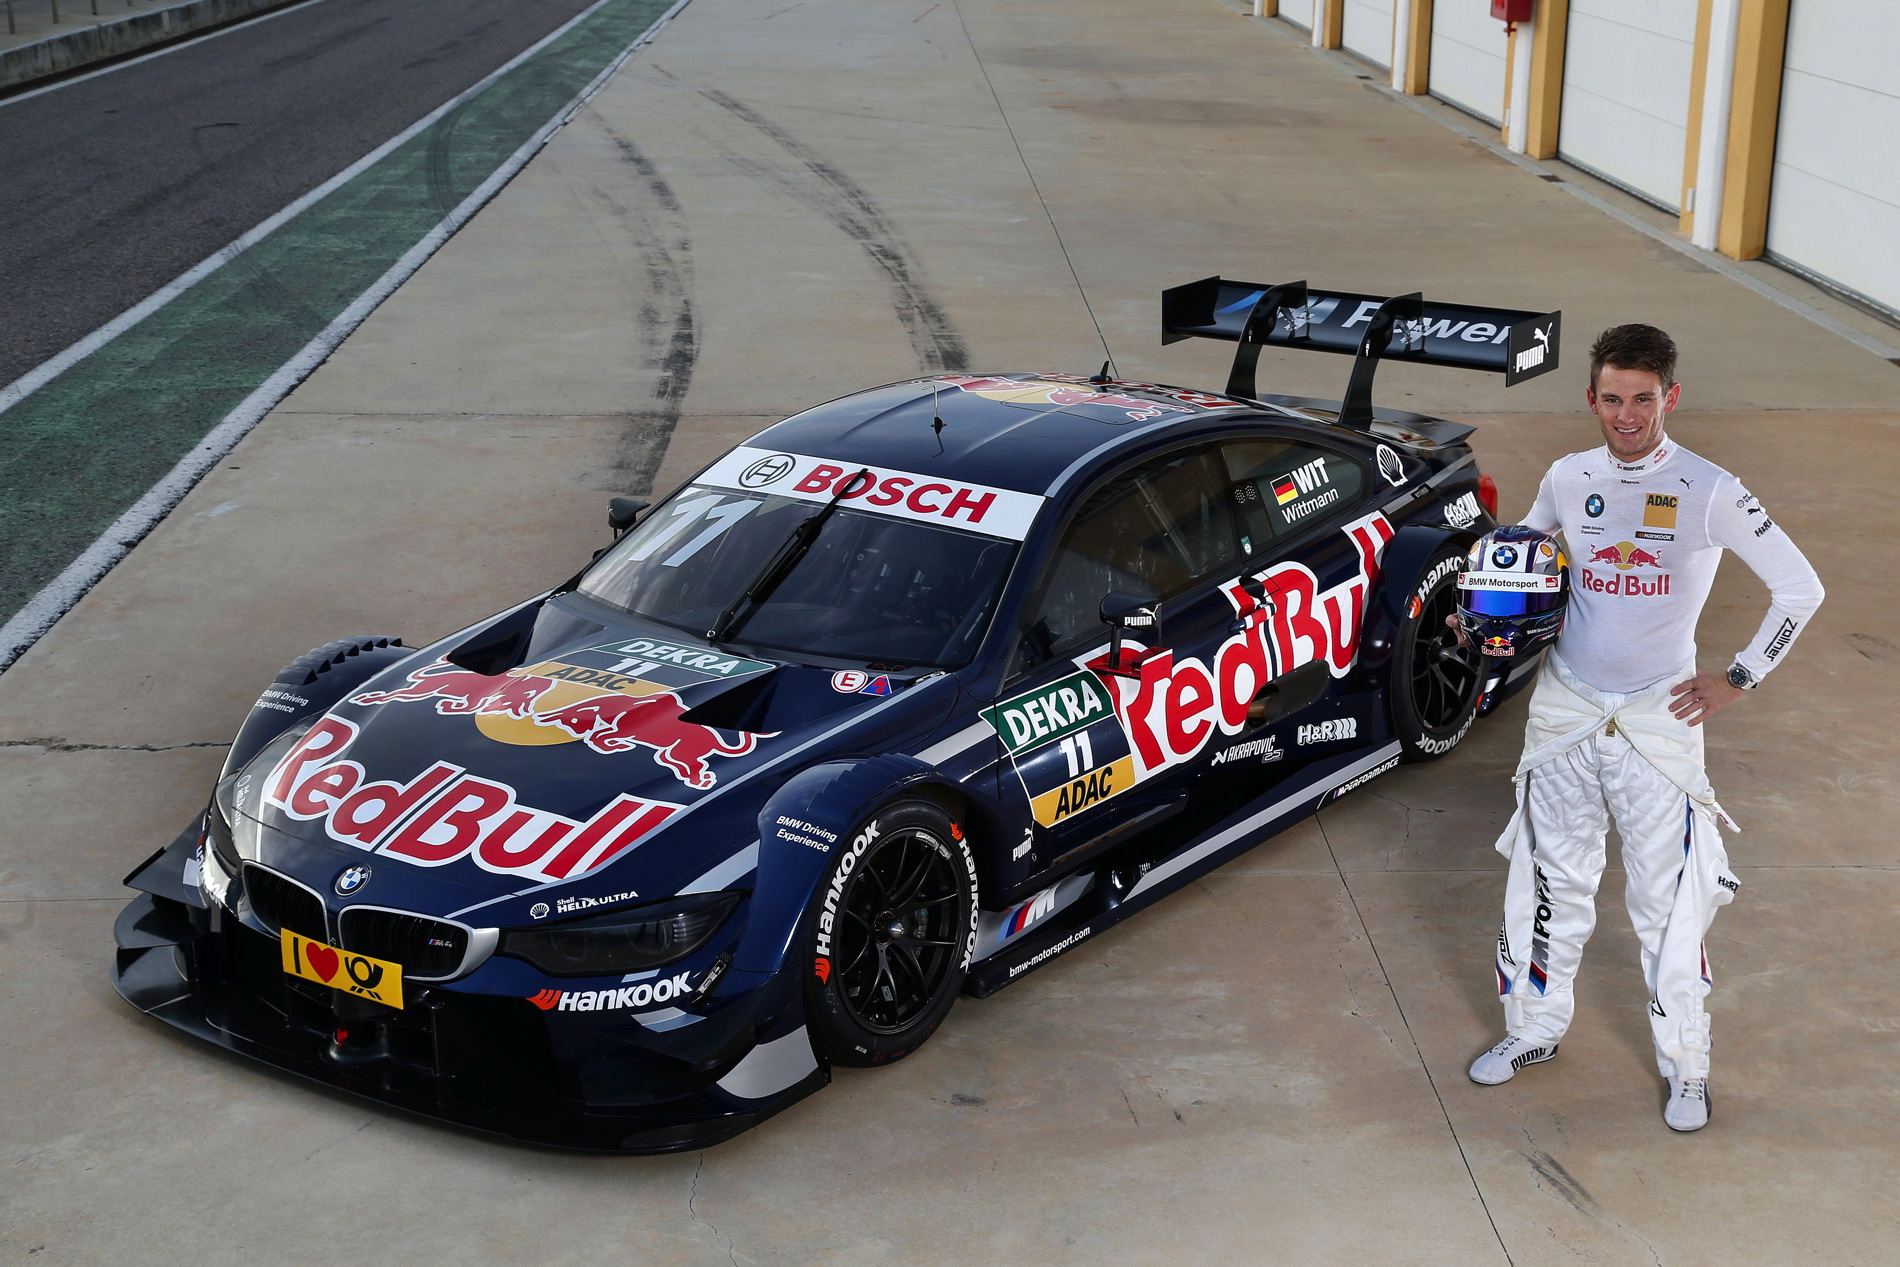 Red Bull BMW M4 Marco Wittmann 1